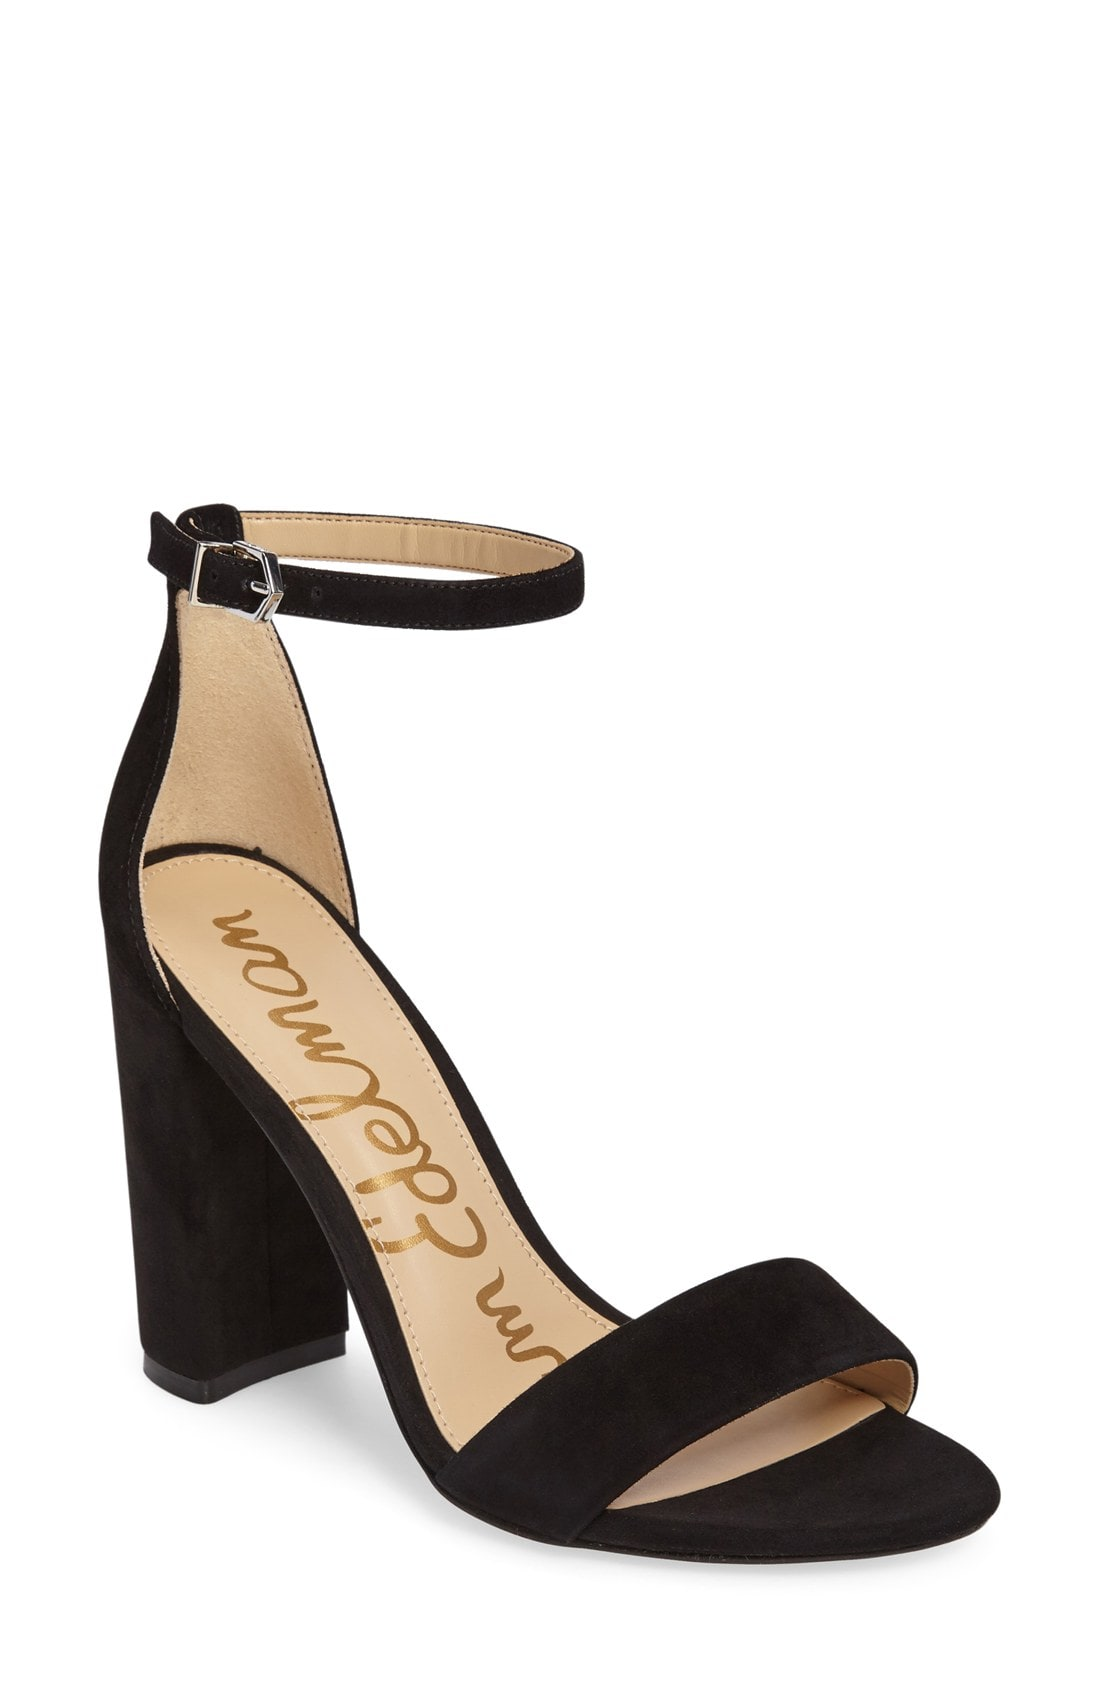 Women's Ankle Strap Heels | Nordstrom